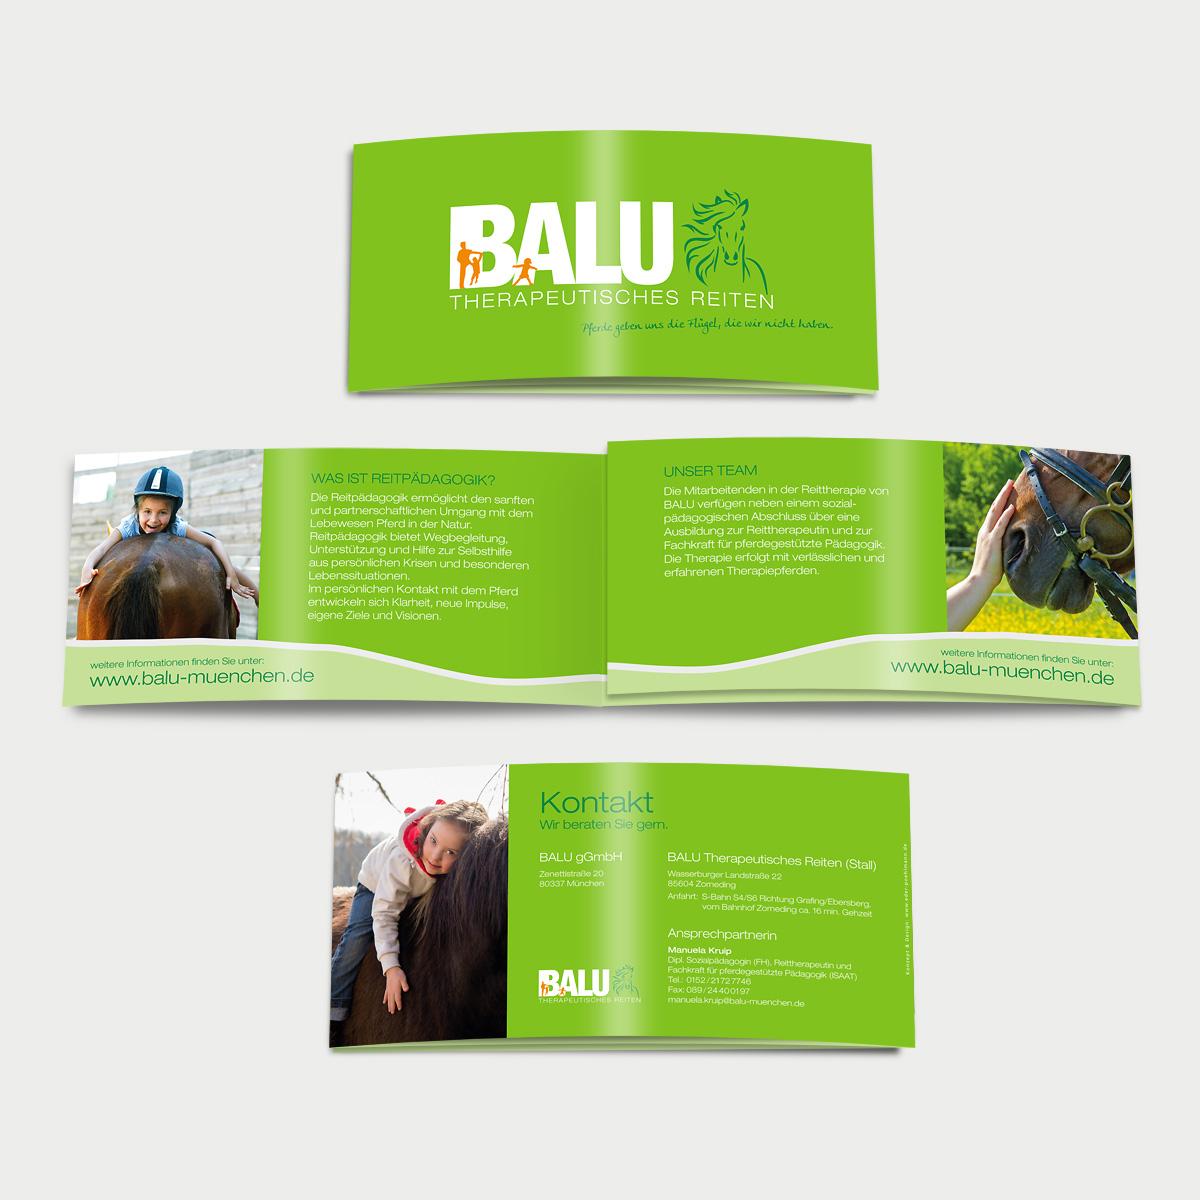 Balu-Muenchen-Reiten-Folder